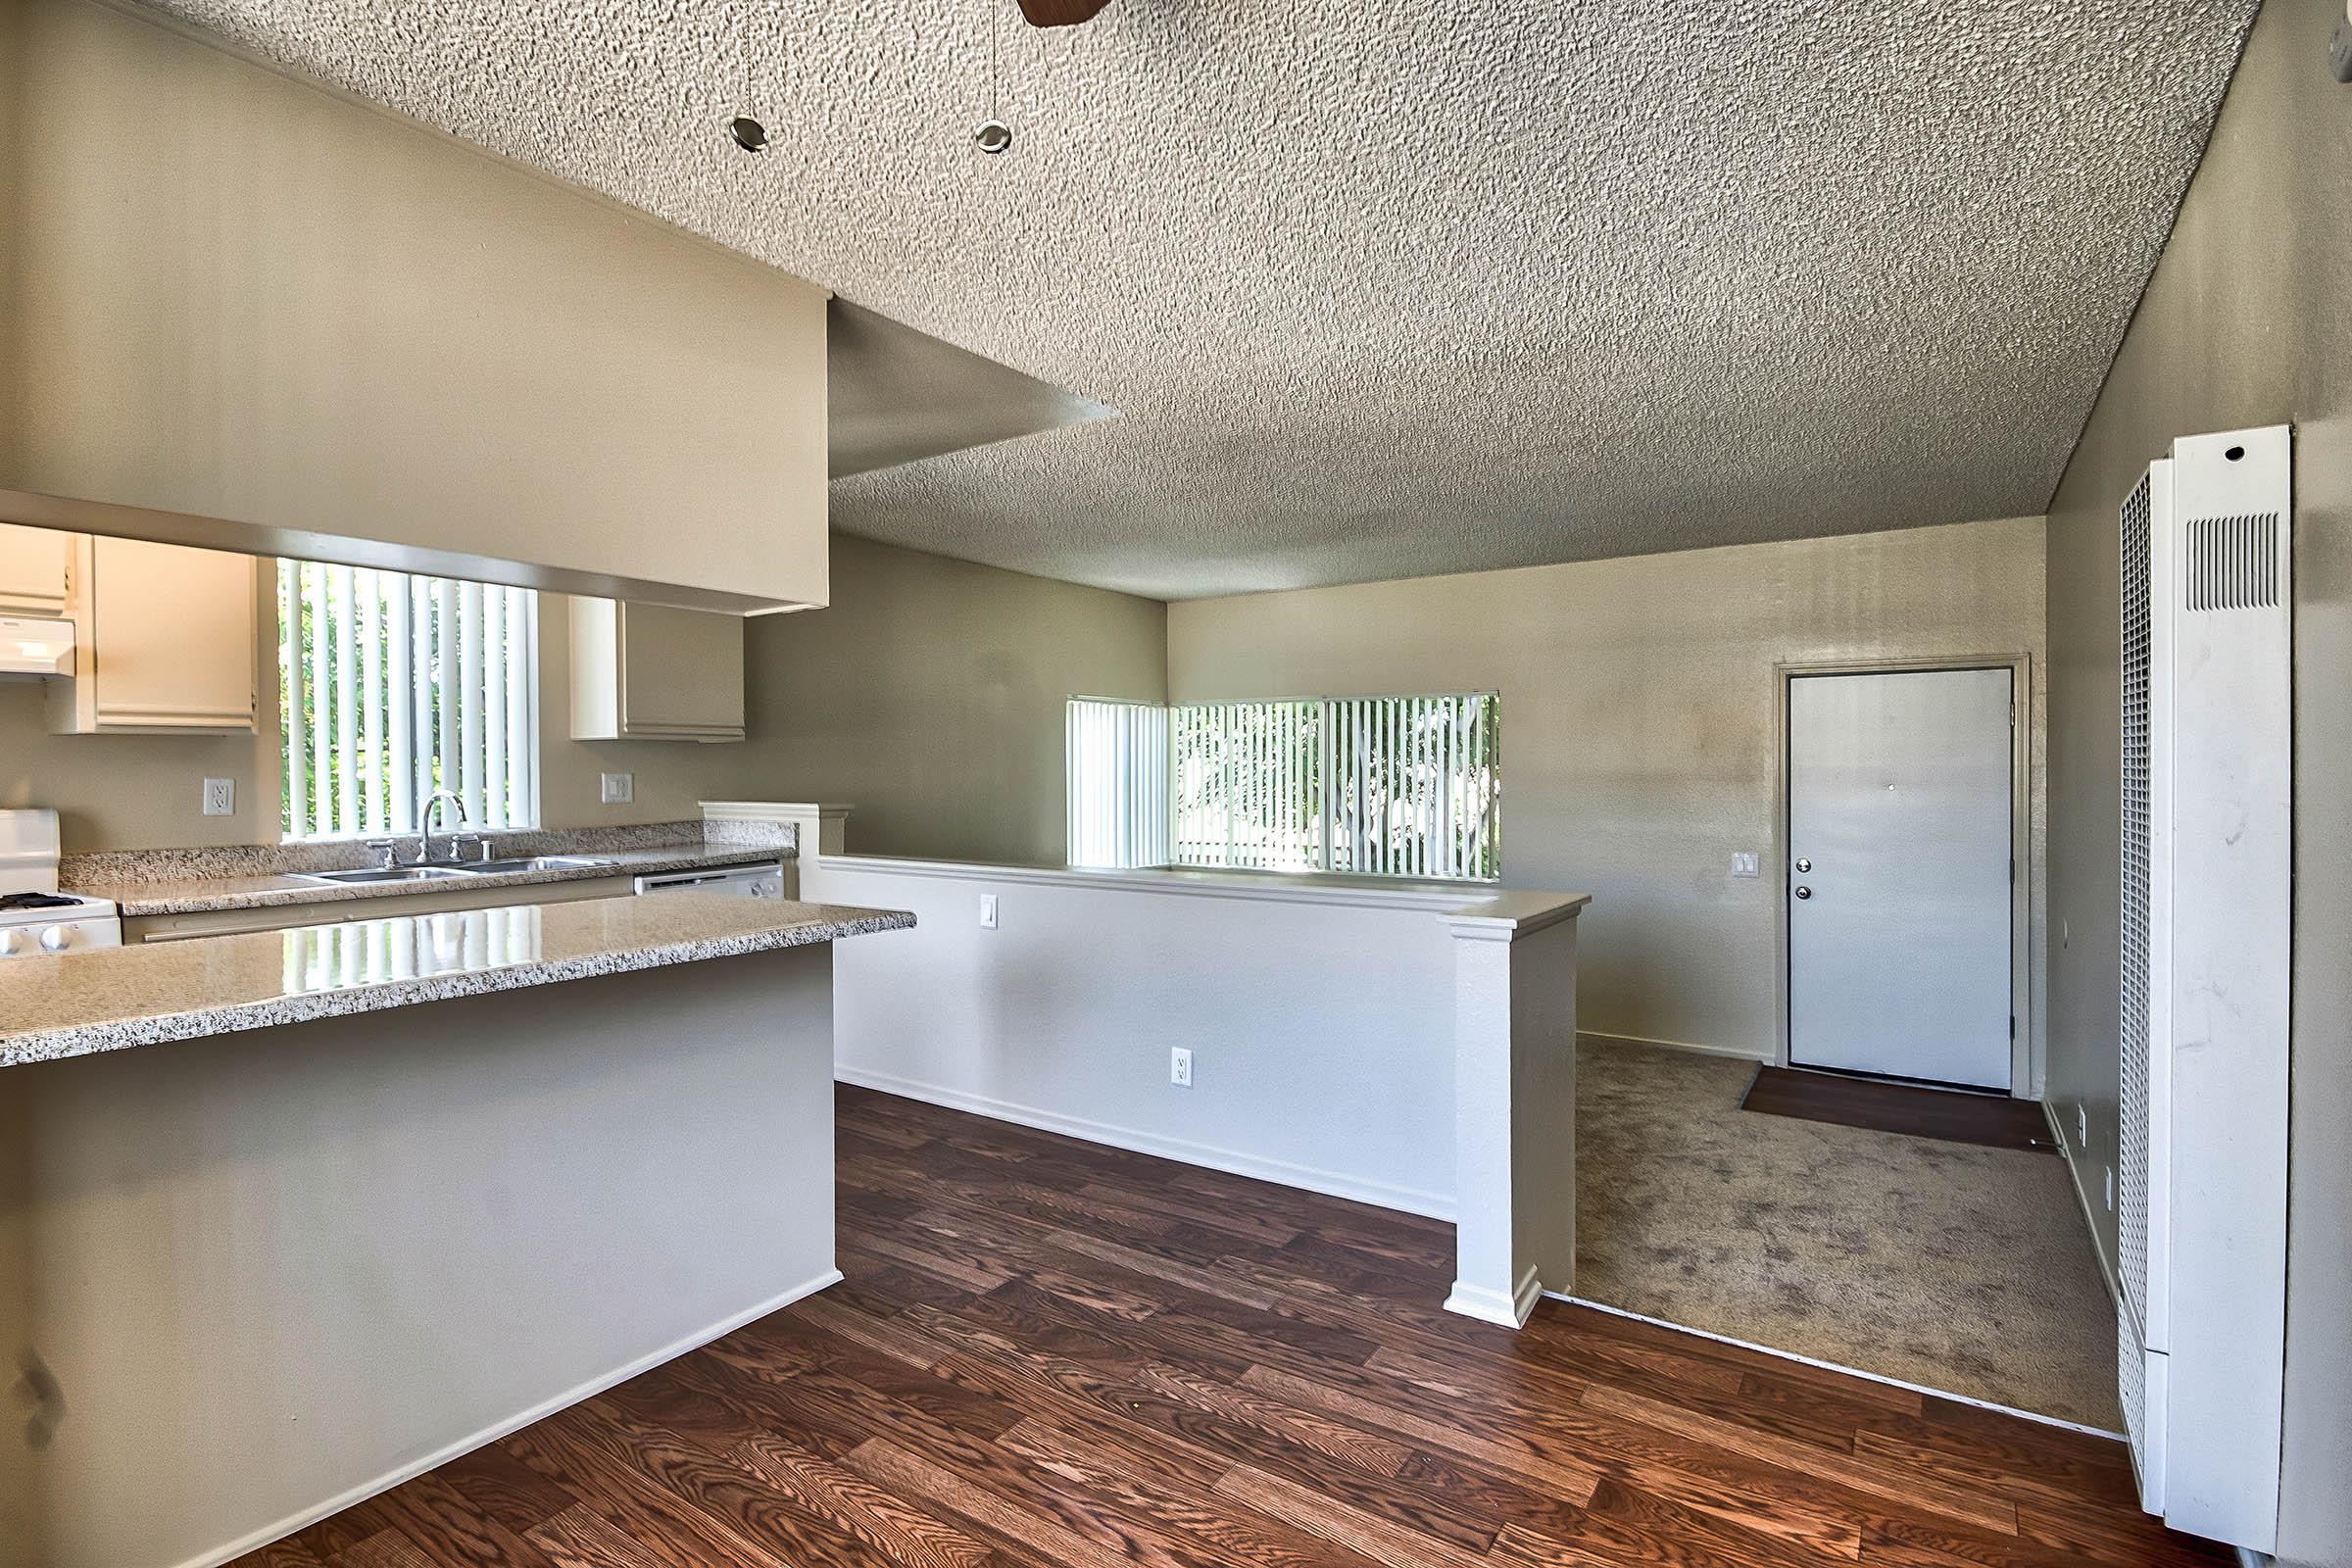 Living-Room_3900_W_5th_St_Santa_Ana_CA_Vintage-Woods_RPI_II-280948-36_v1_current.jpg